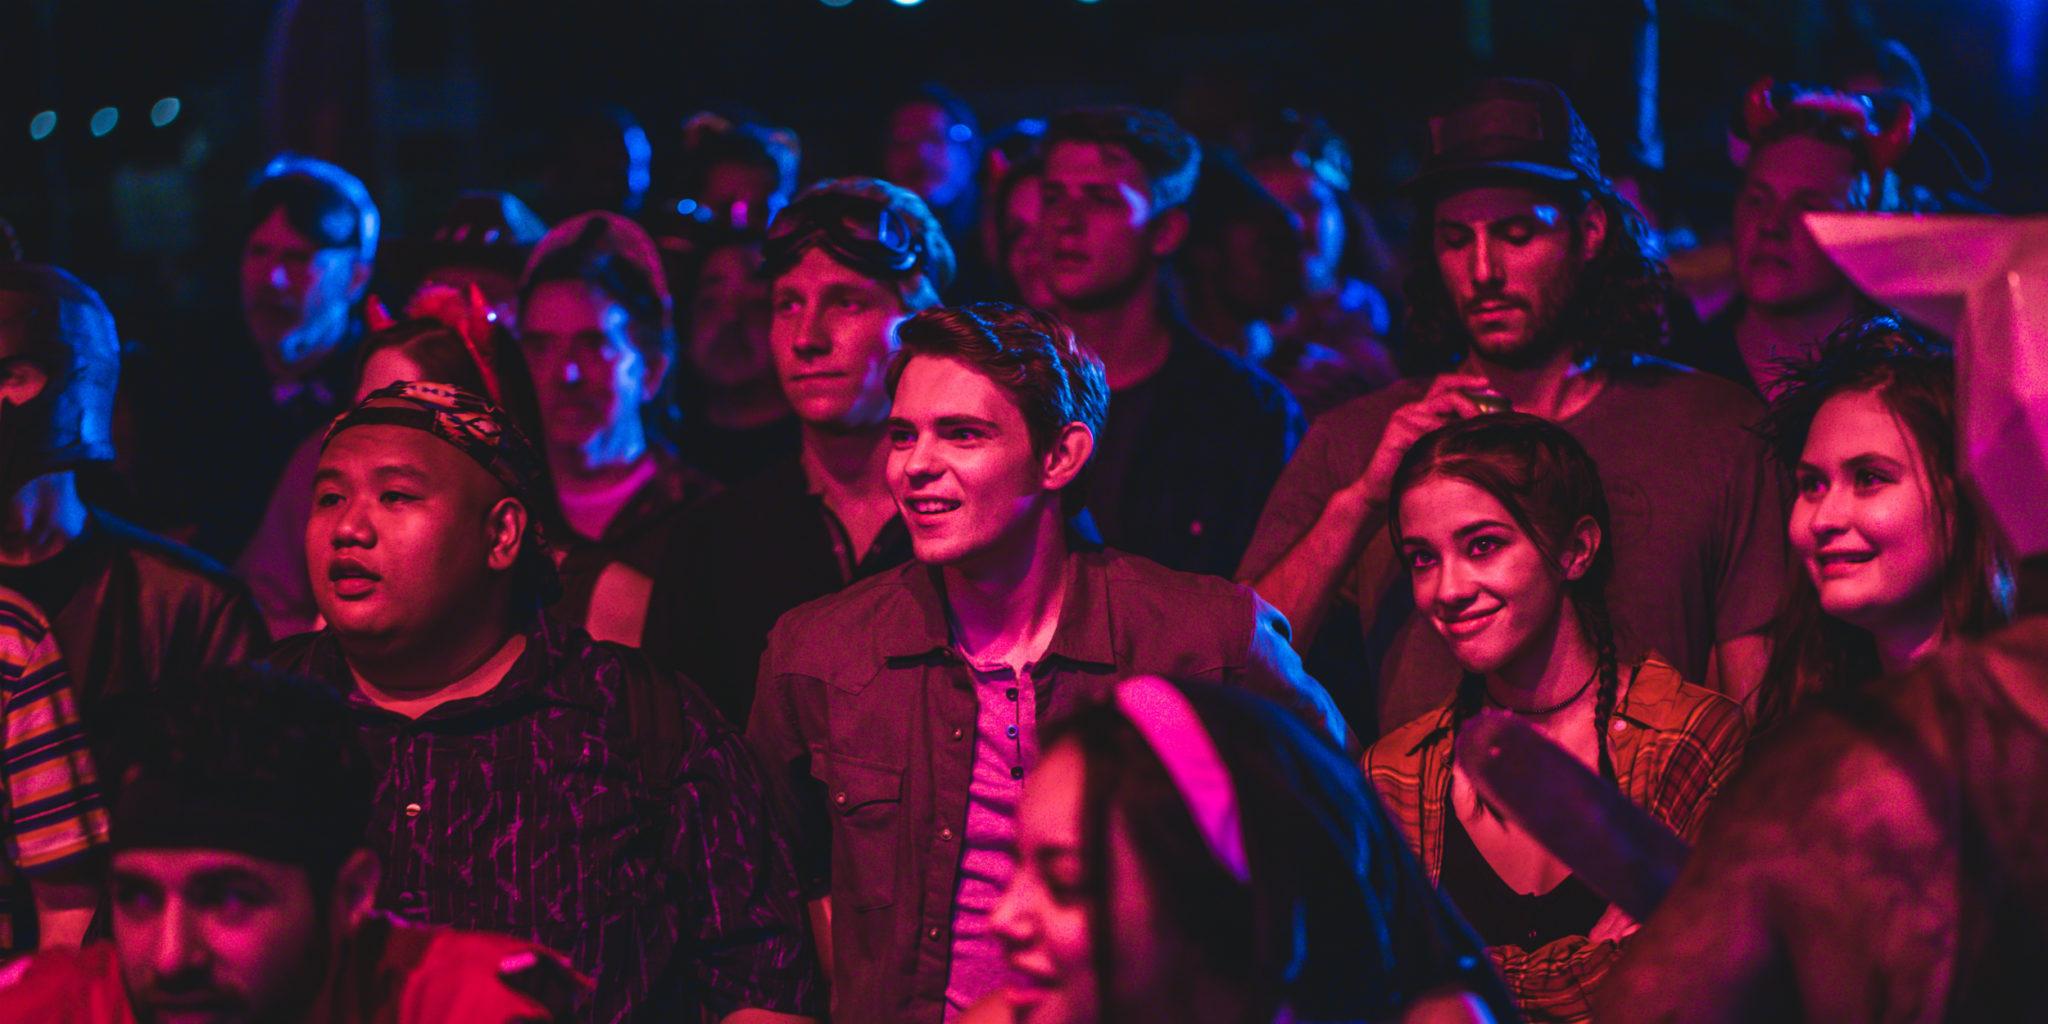 'Blood Fest' forma parte del programa Dark Visions de Nocturna Madrid 2018.